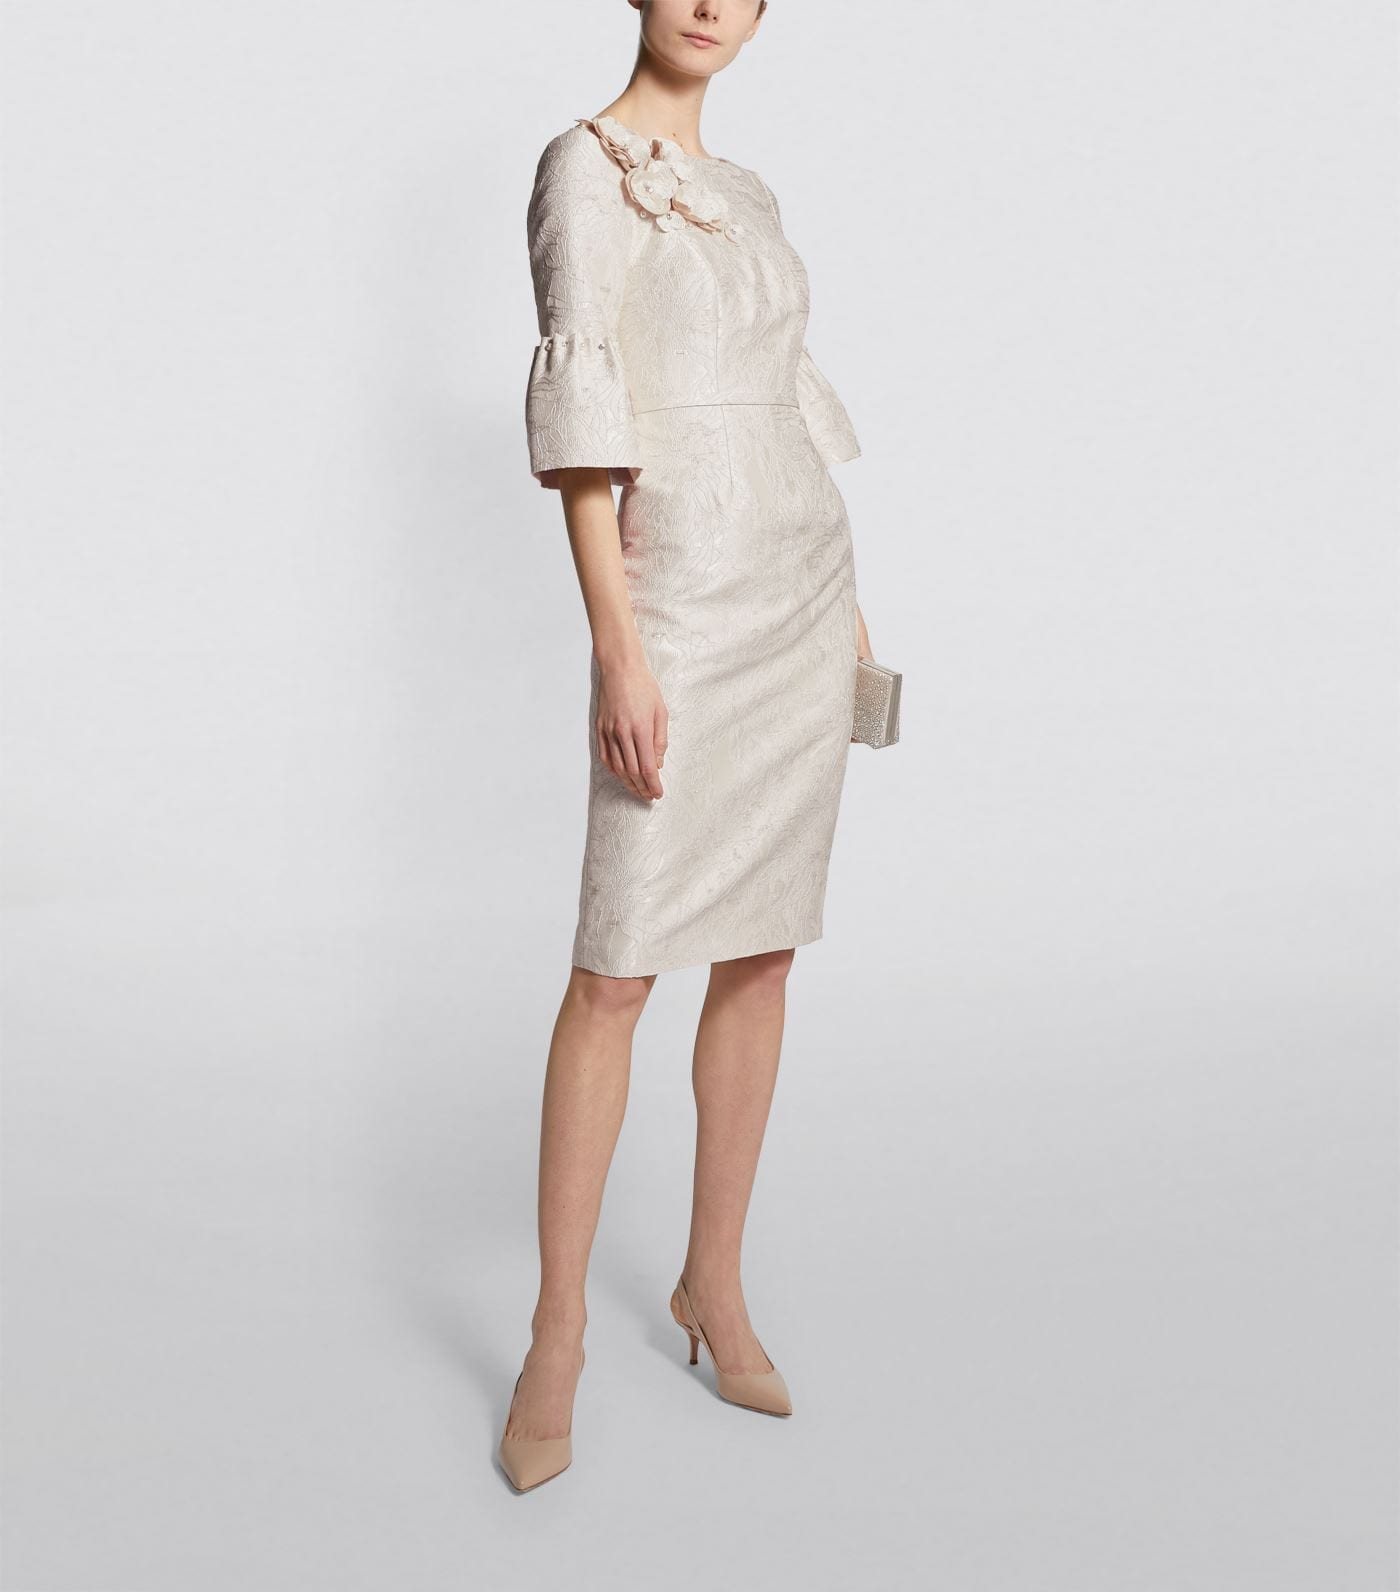 JOHN CHARLES Flower Appliqué Jacquard Dress